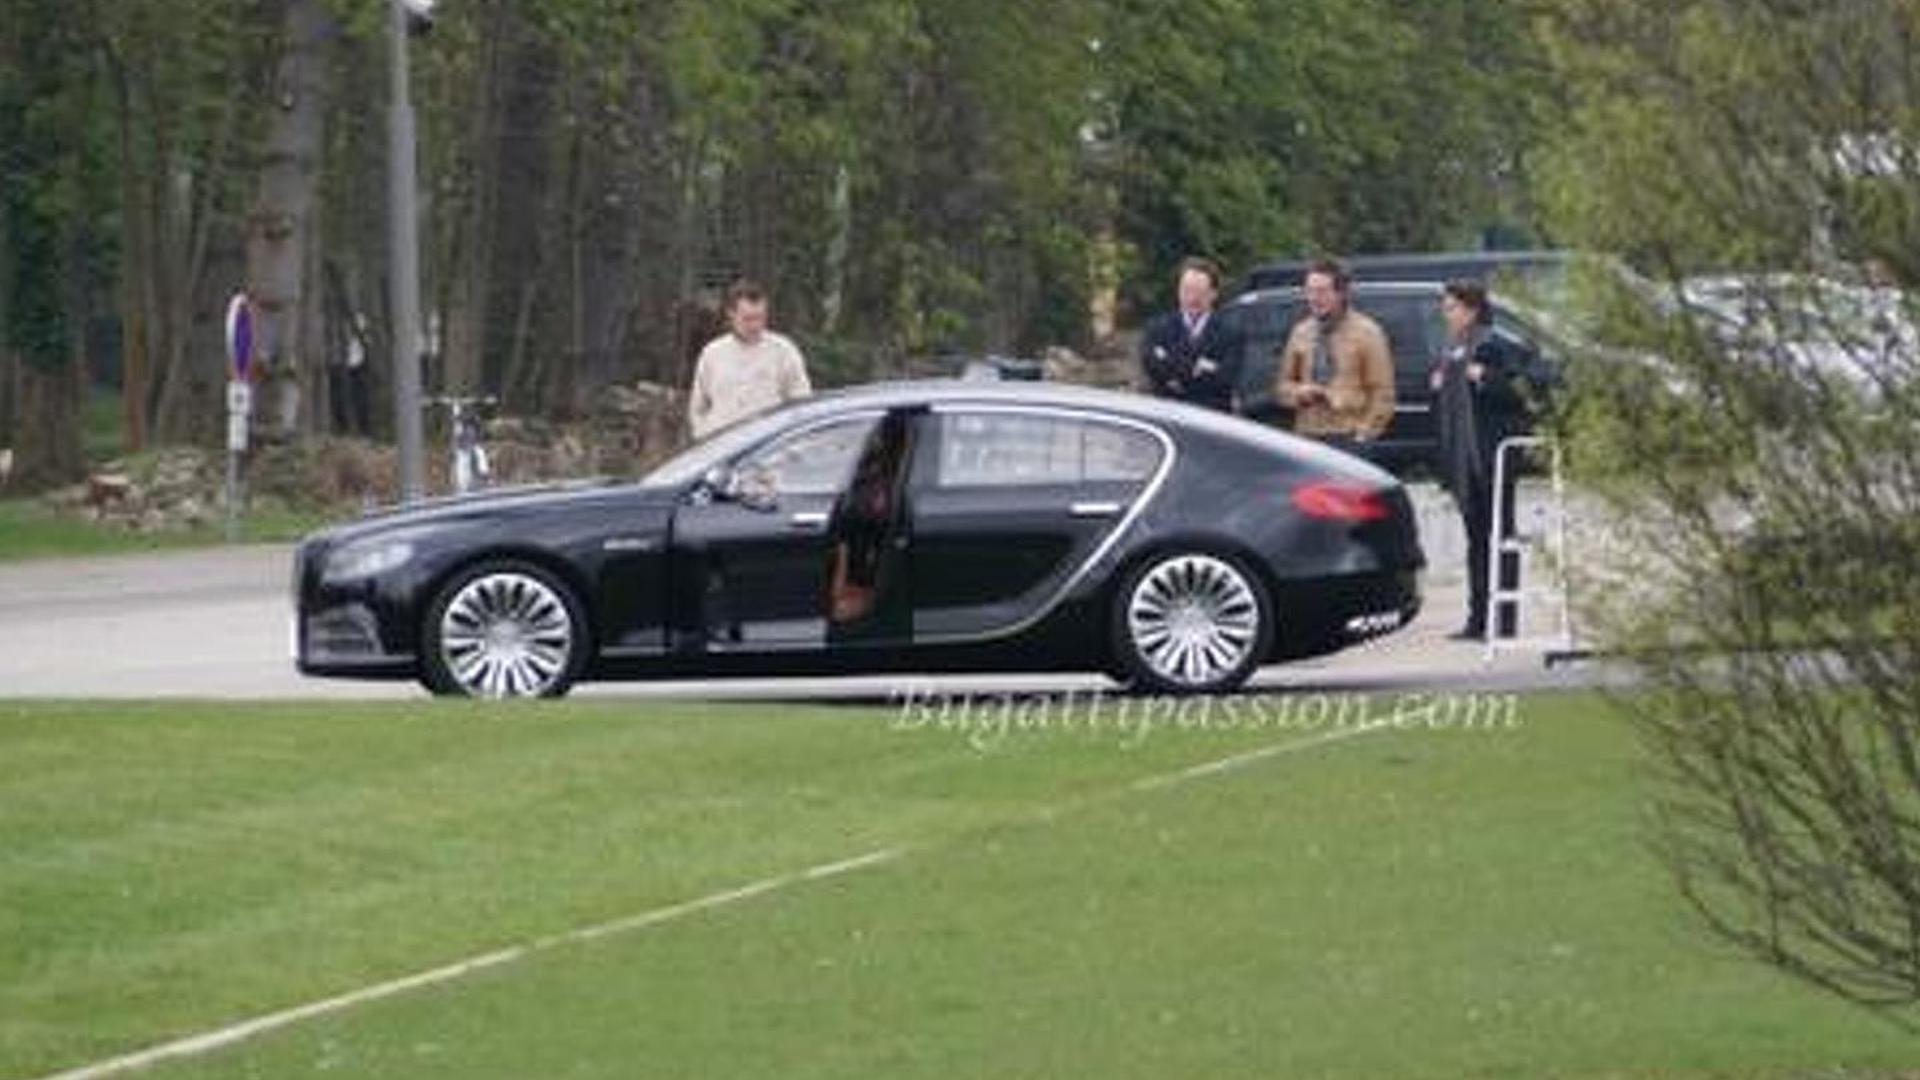 Bugatti Galibier Engine Bugatti 16c Galibier Spotted Out U0026 About . Bugatti  Galibier ...